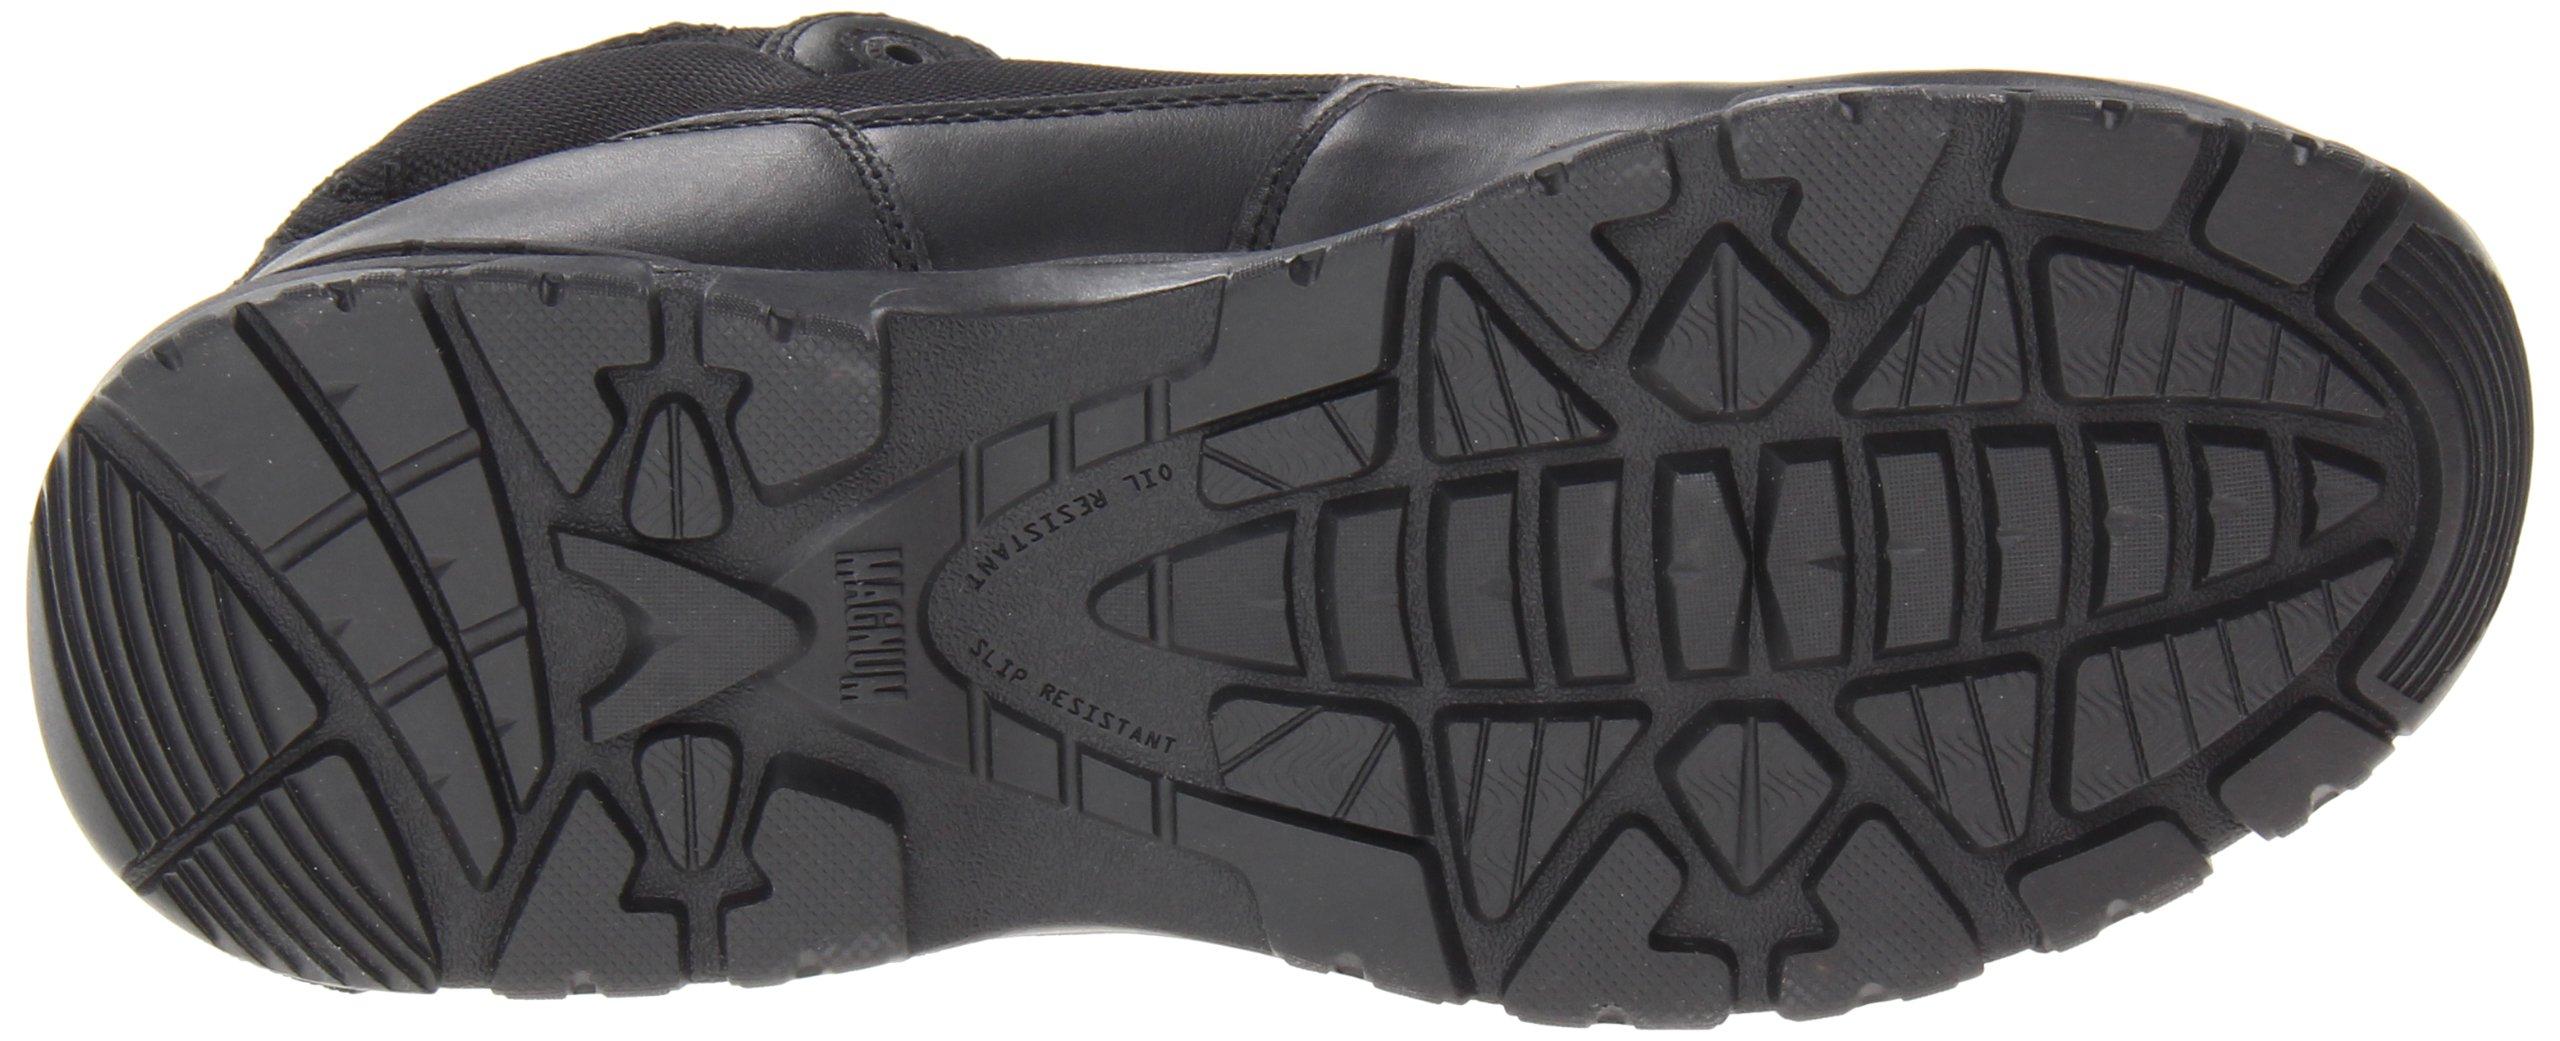 Magnum Men's Viper Pro 5 Waterproof Tactical Boot,Black,13 M US by Magnum (Image #3)